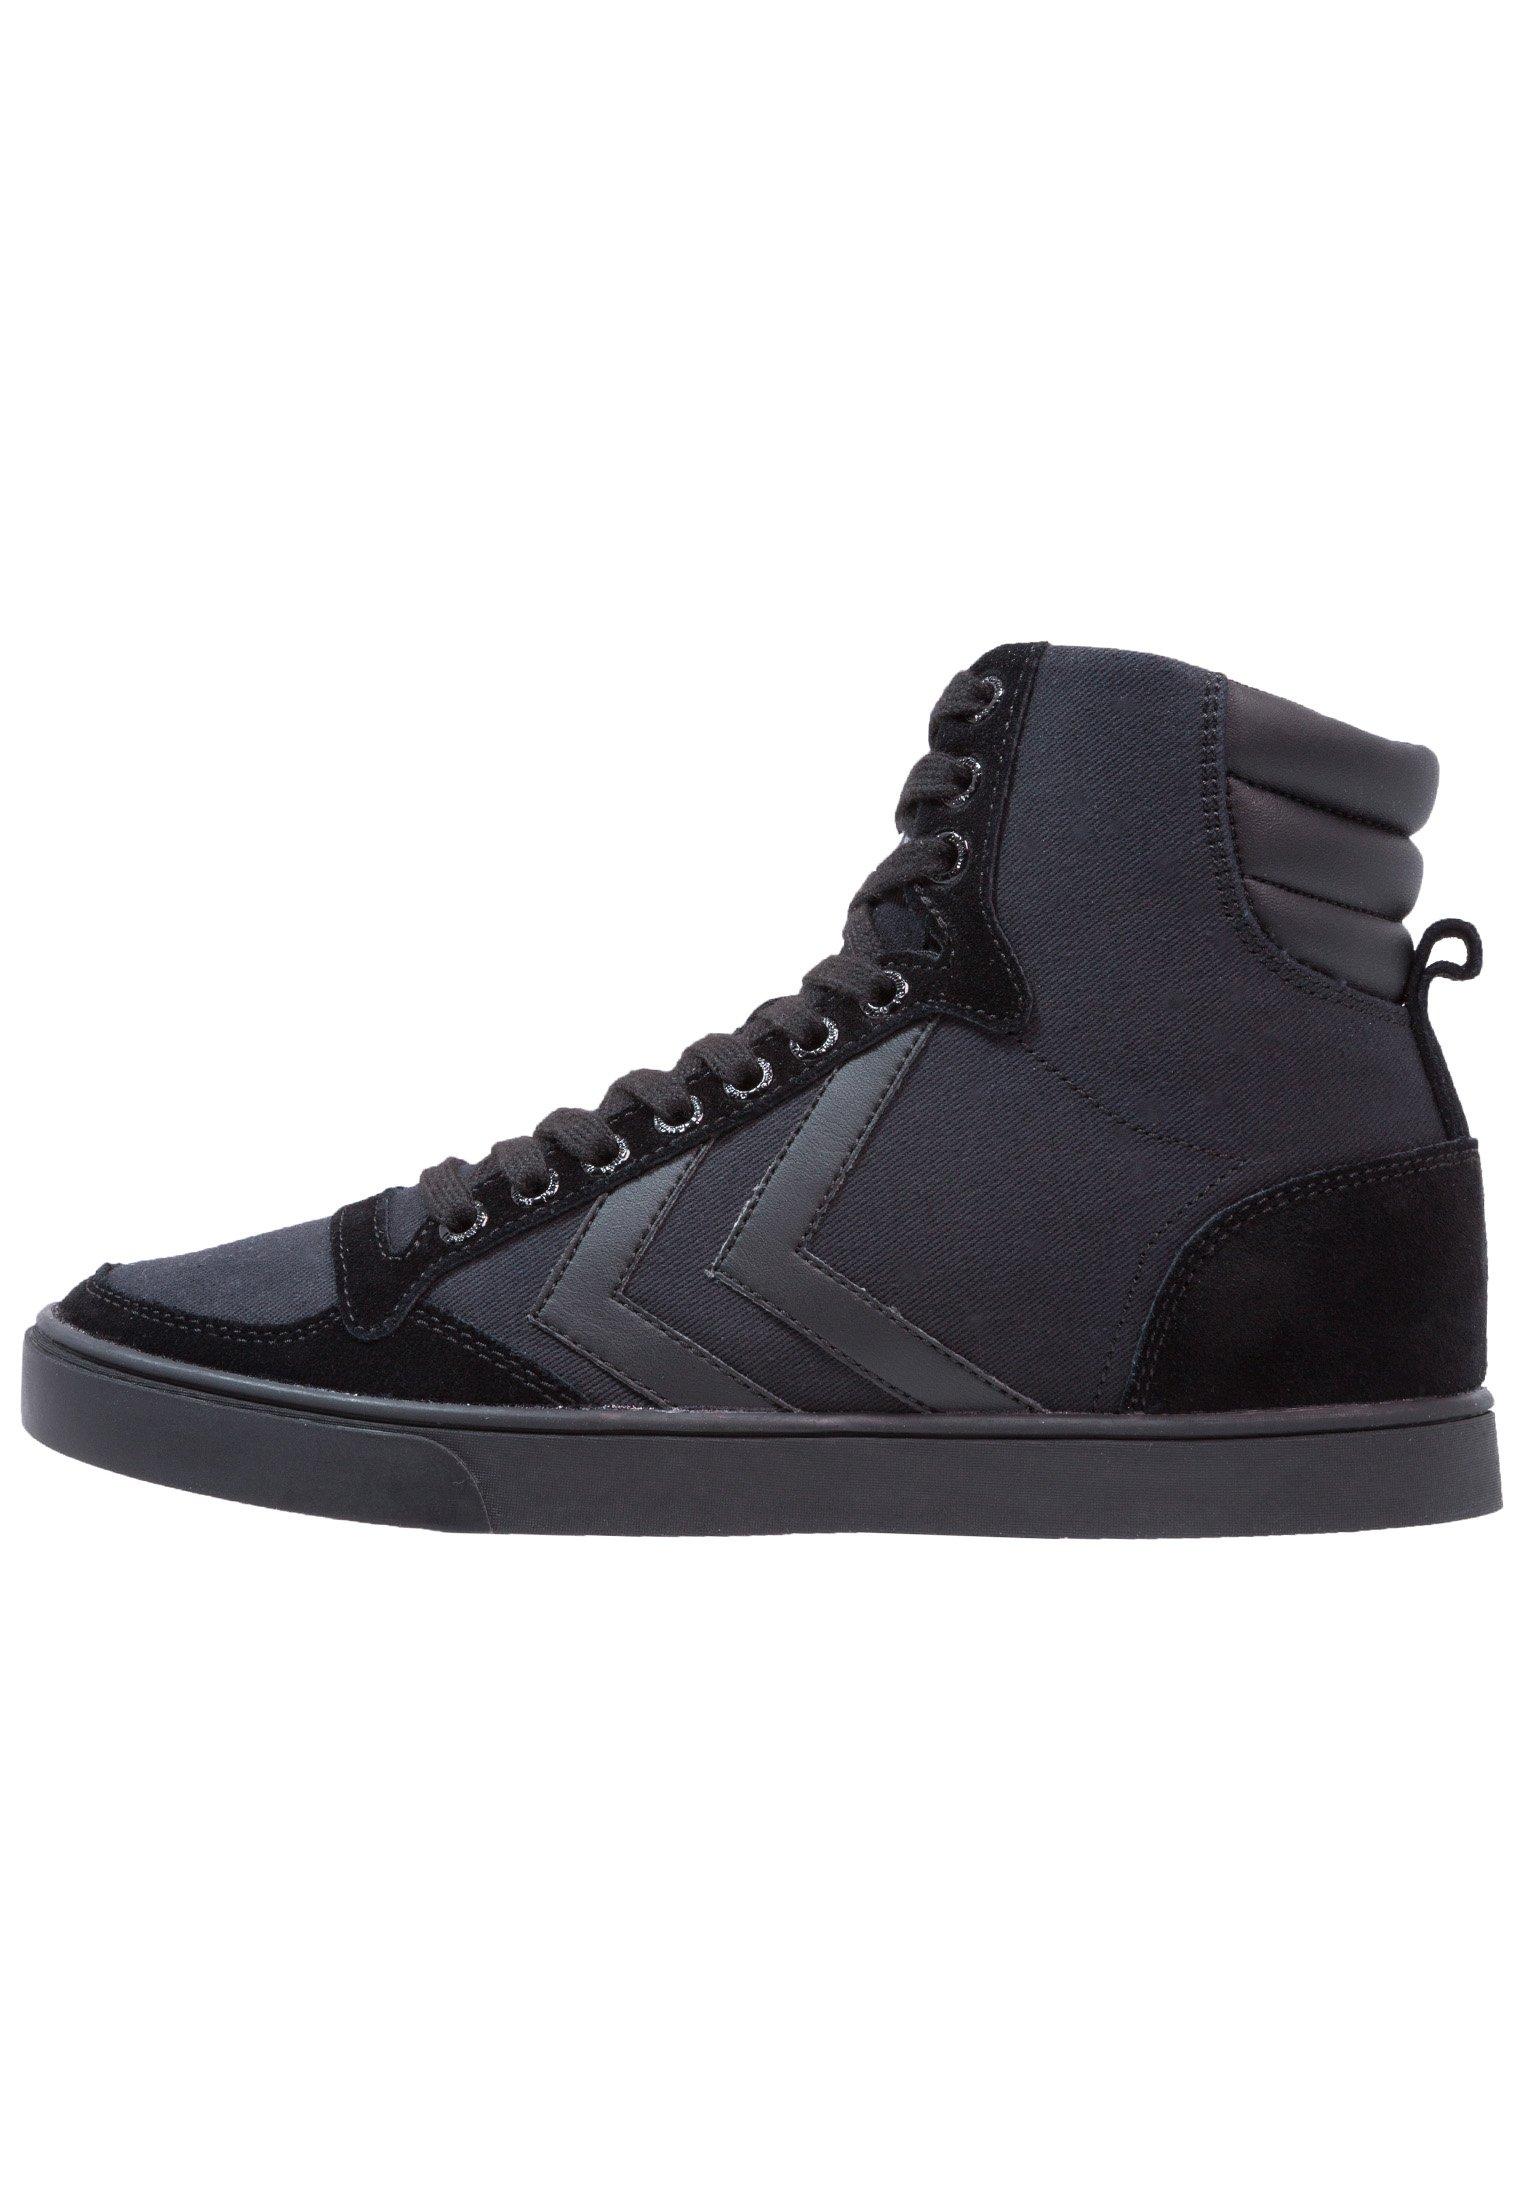 Hummel Slimmer Stadil Tonal - Höga Sneakers Black 2jmeSz4